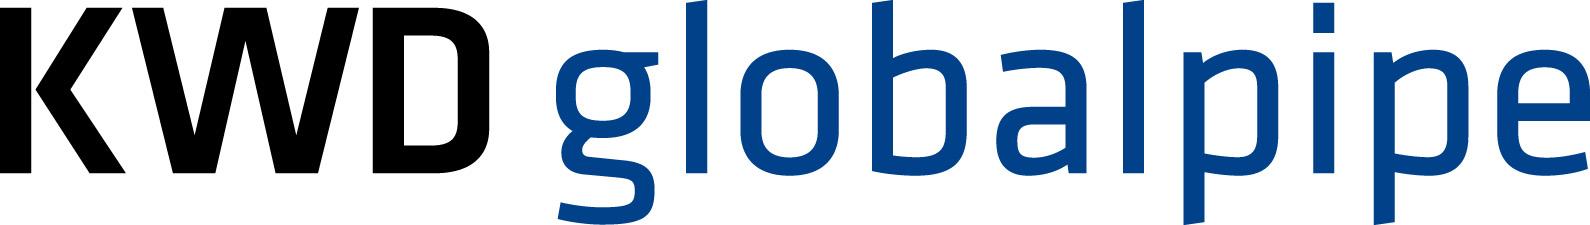 kwd-globalpipe_logo_2012_RGB (1).jpg